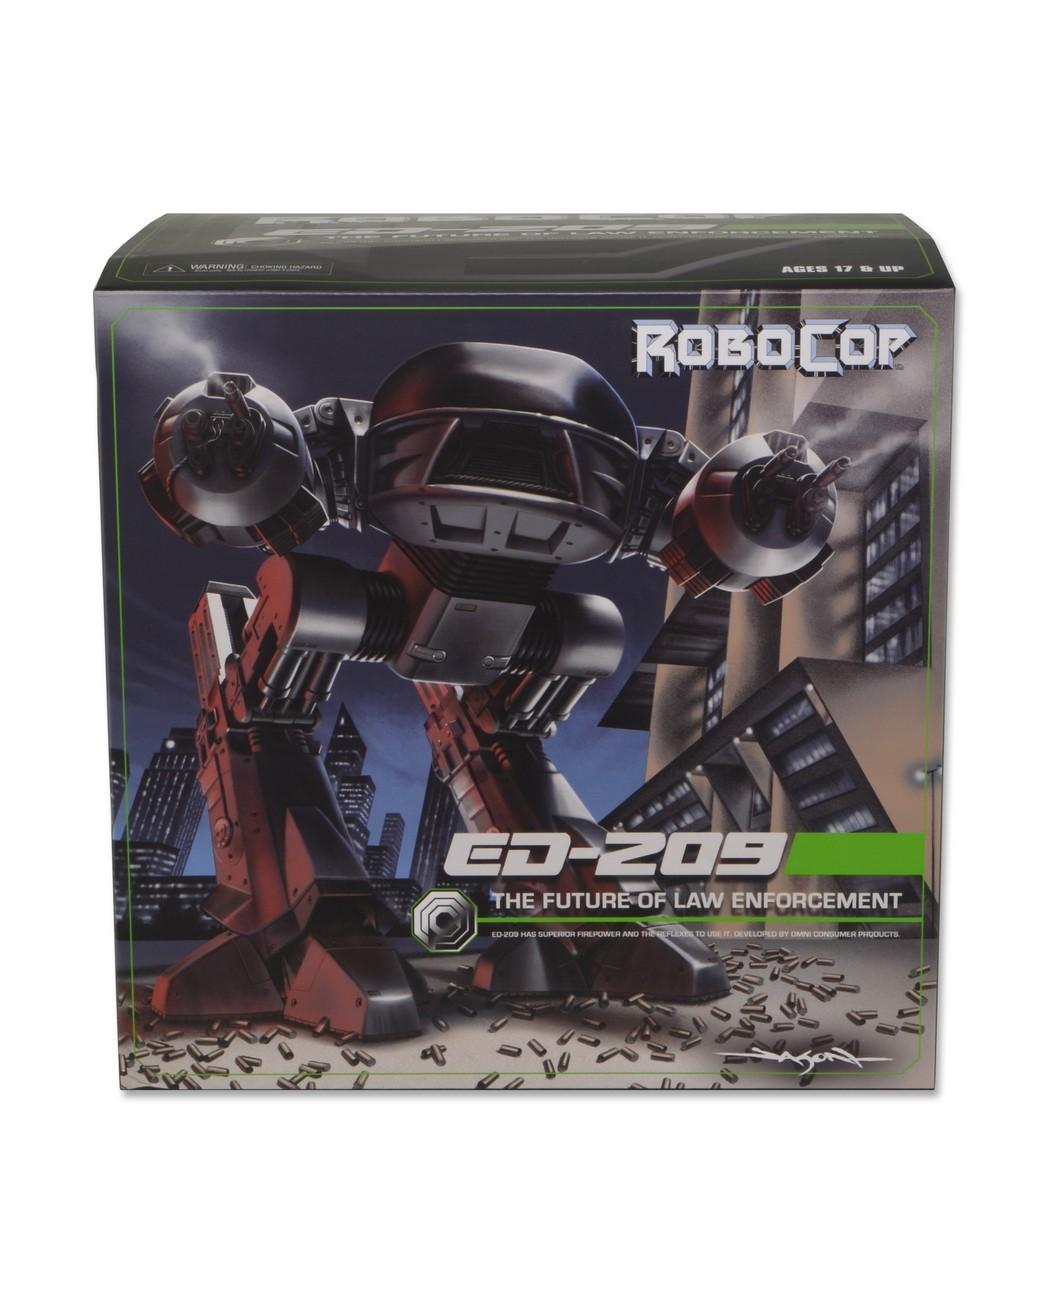 [NECA] RoboCop - ED-209 NECA-Robocop-1987-ED-209-008